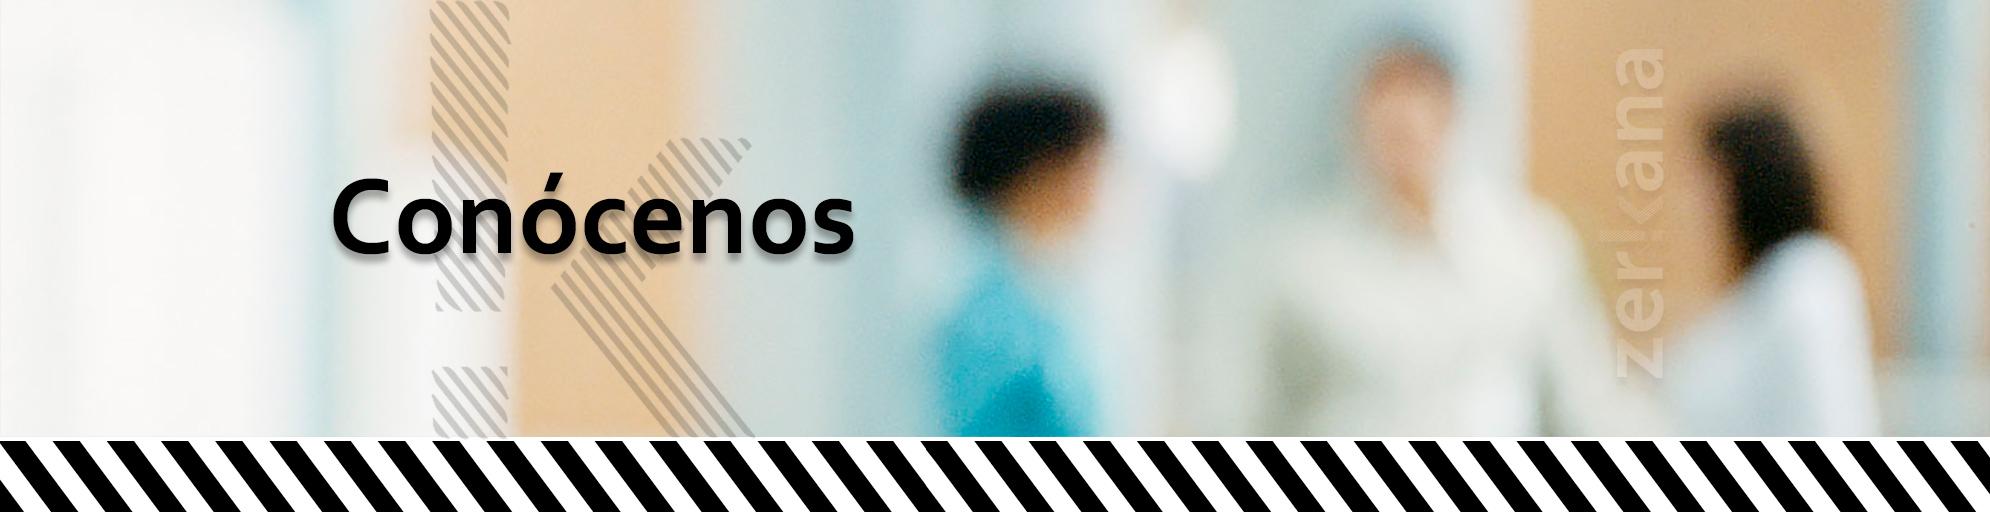 conocenos-banner-secc4